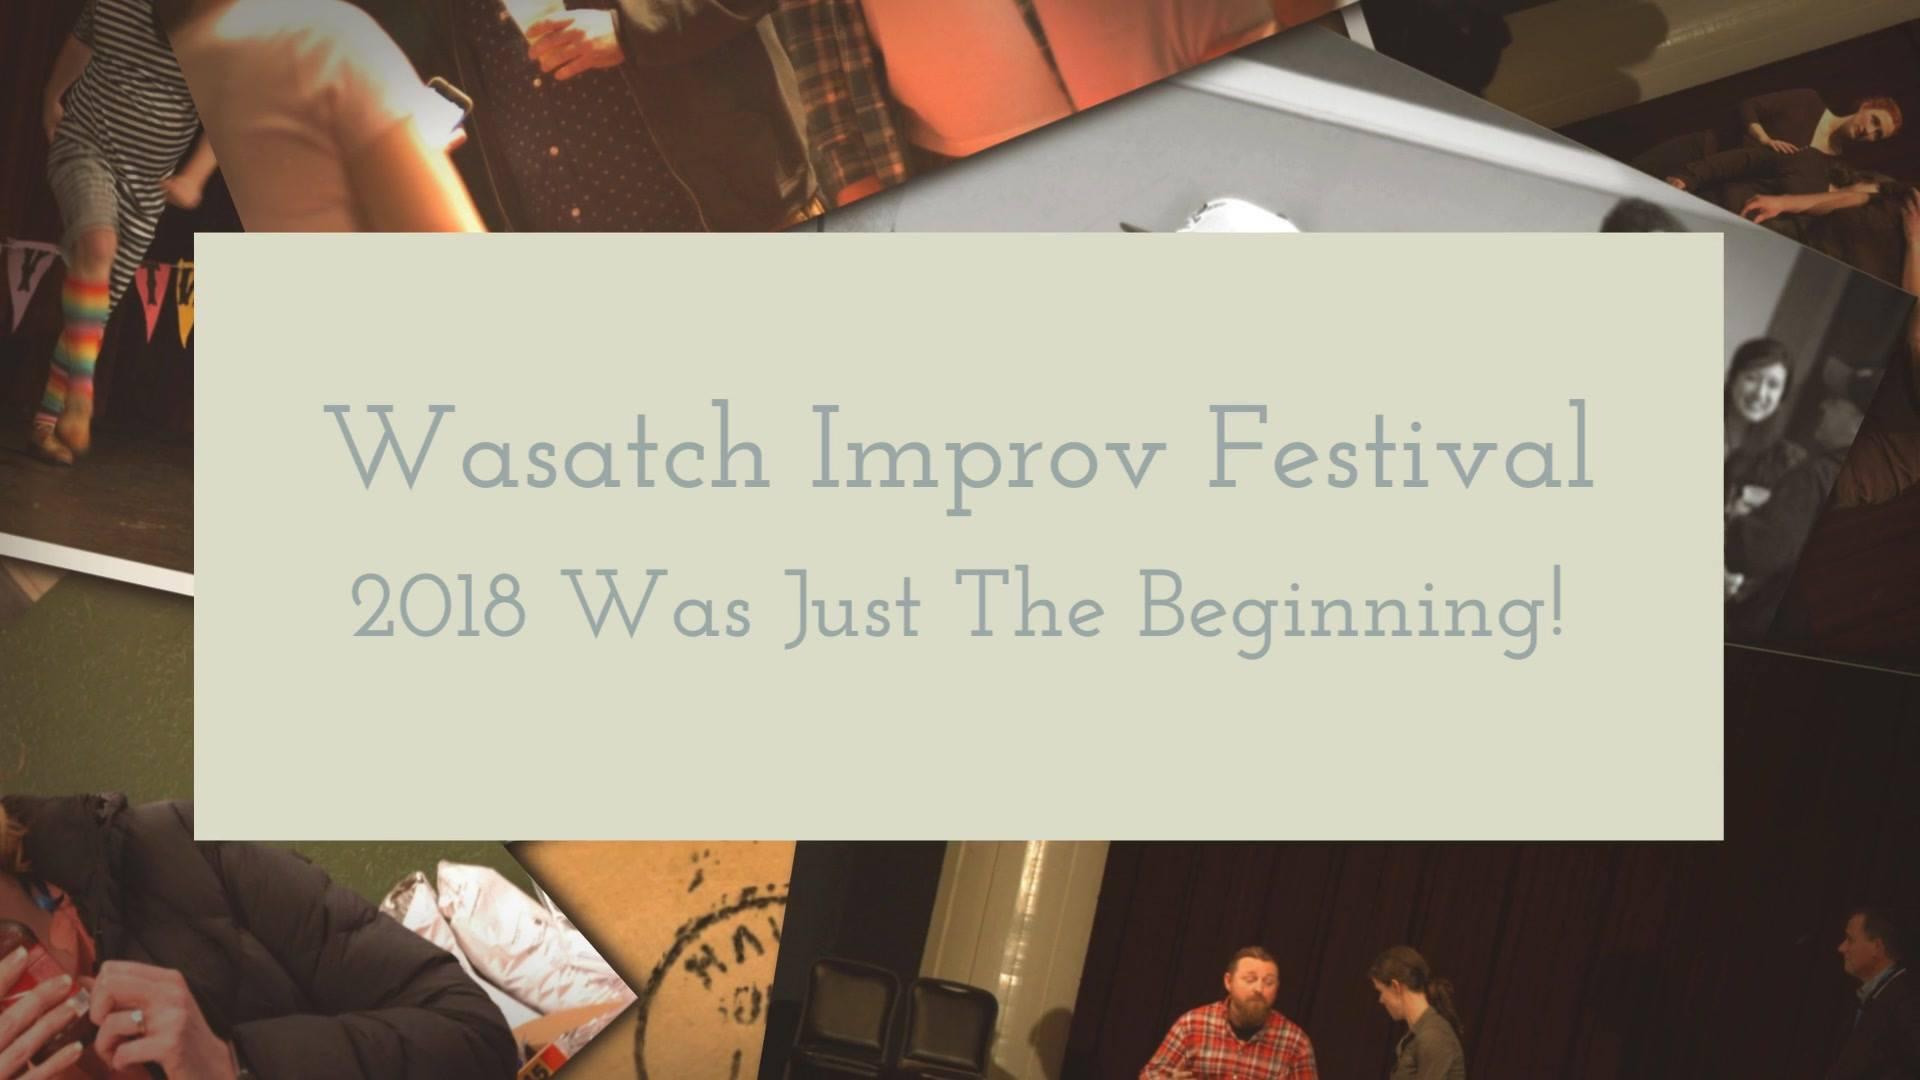 Wasatch Improv Festival 2018 Recap